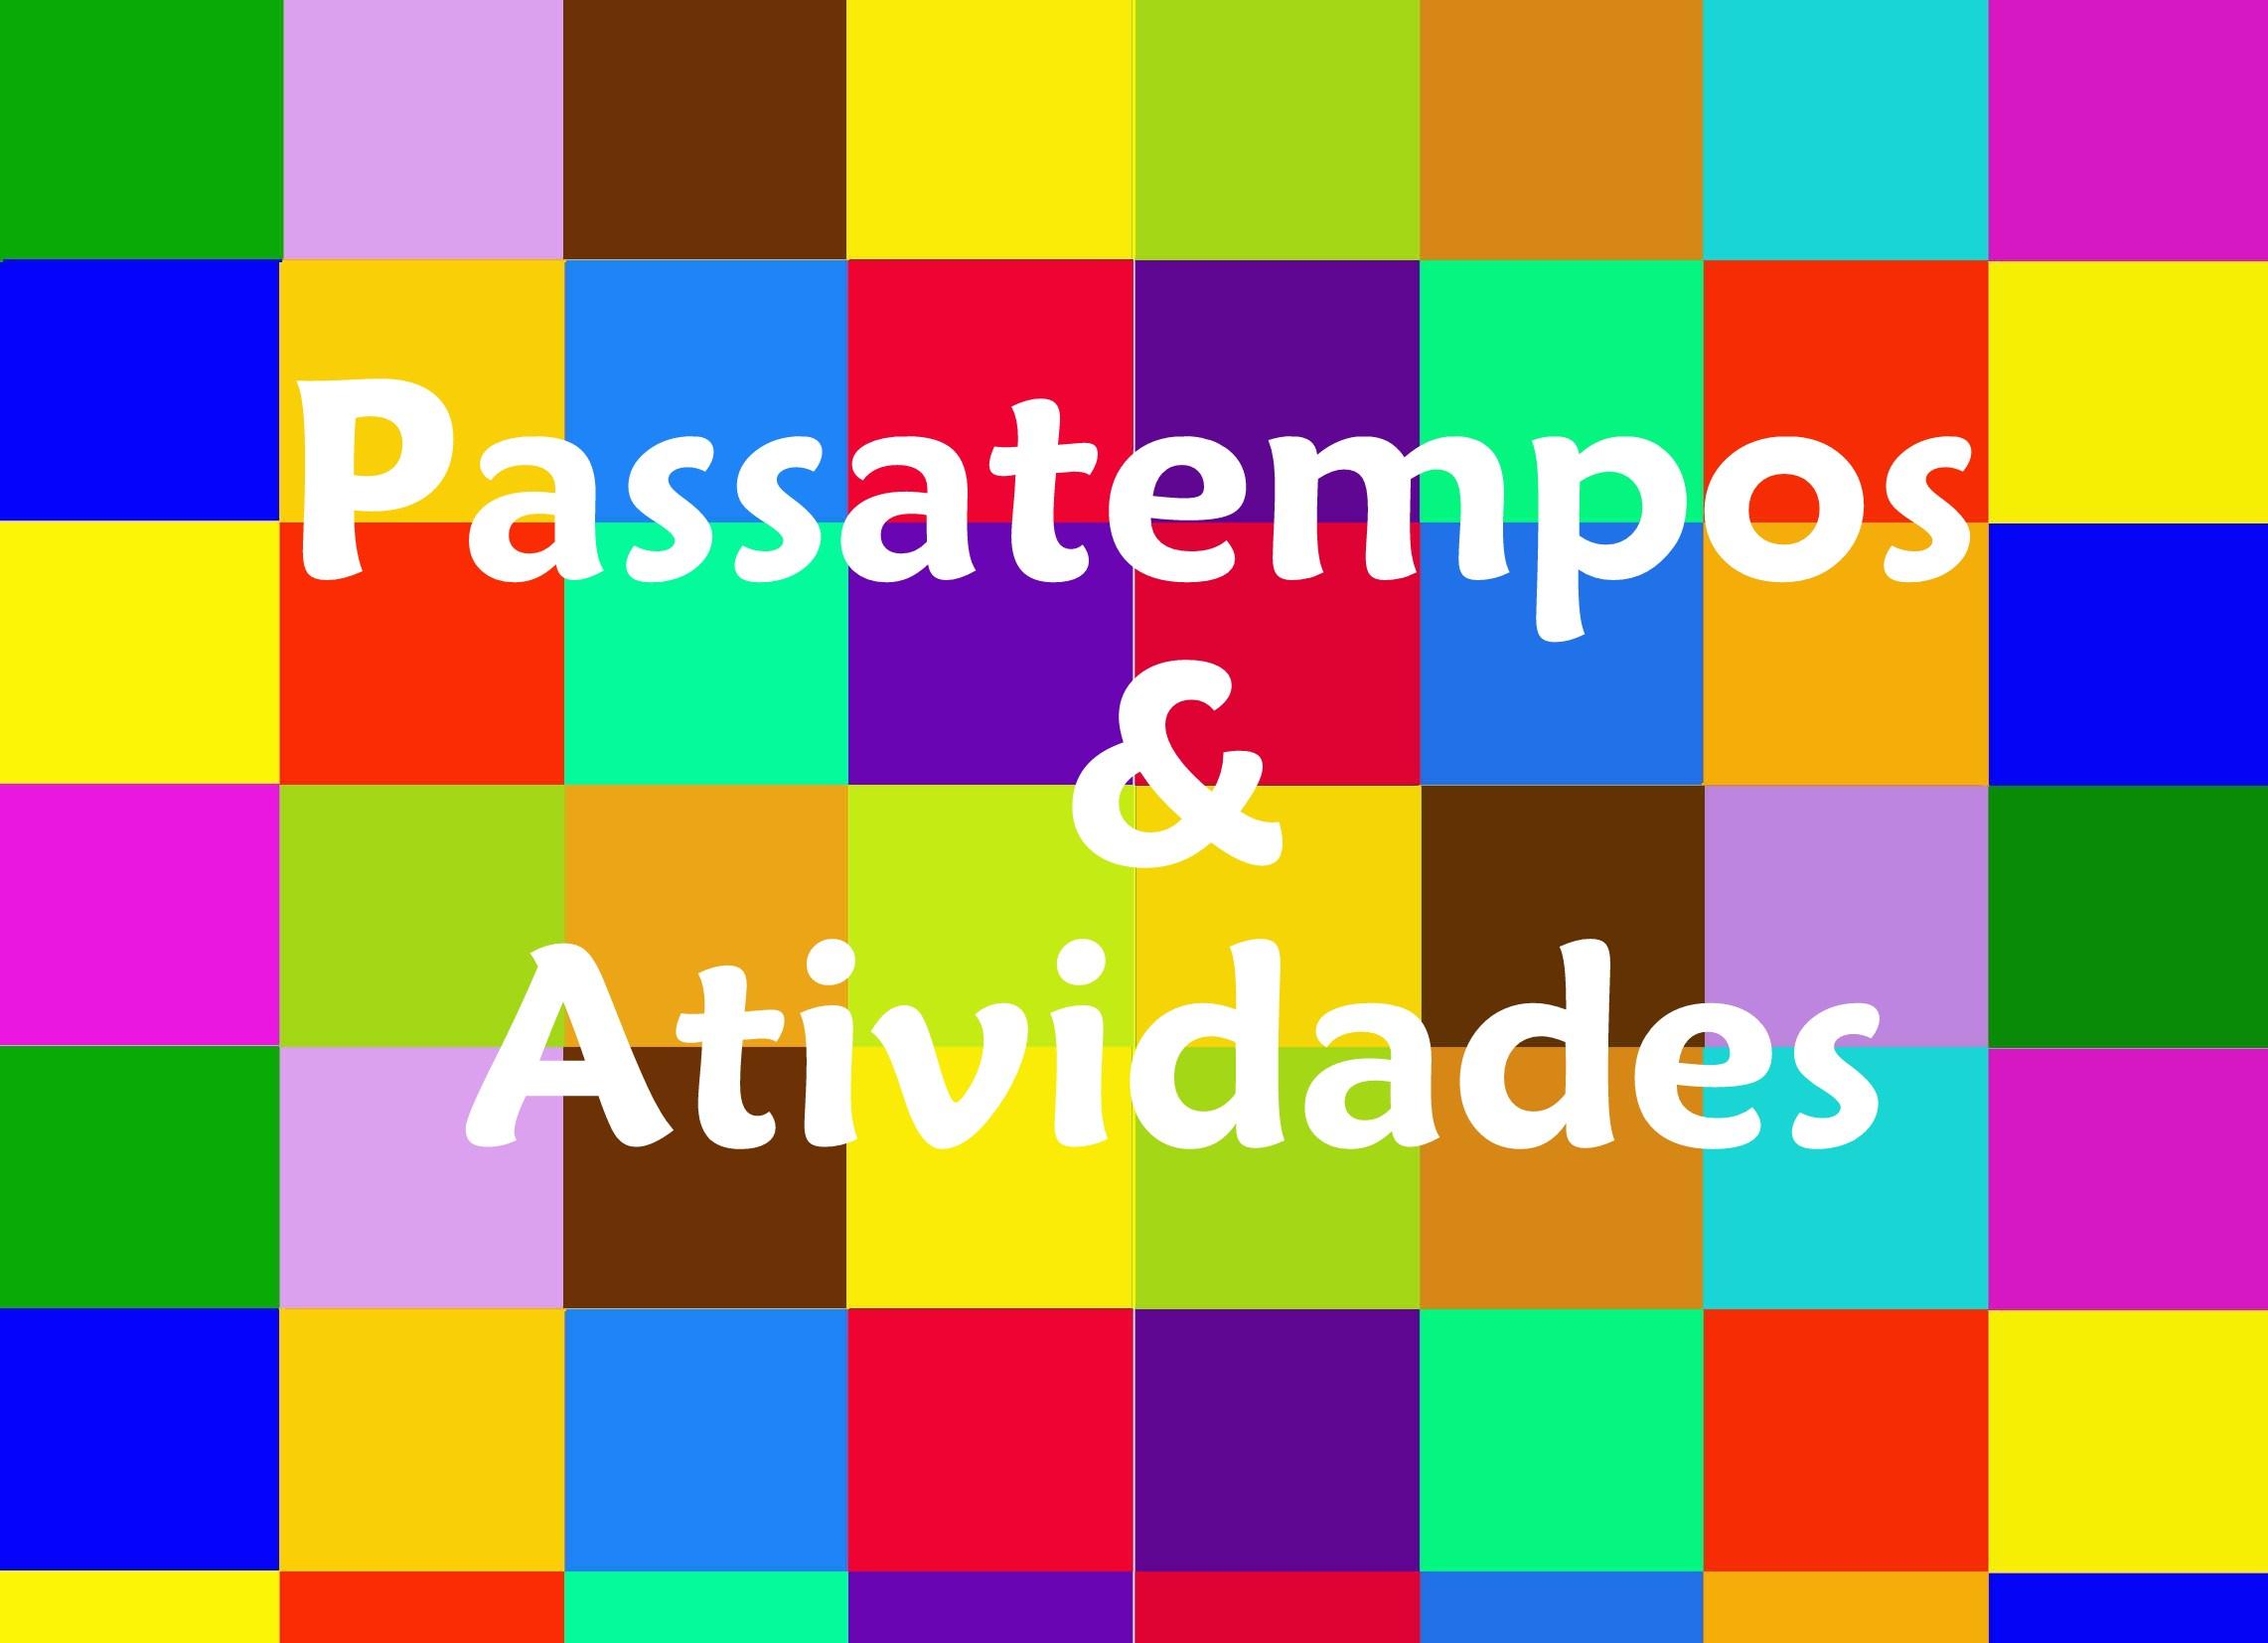 Passatempos & Atividades